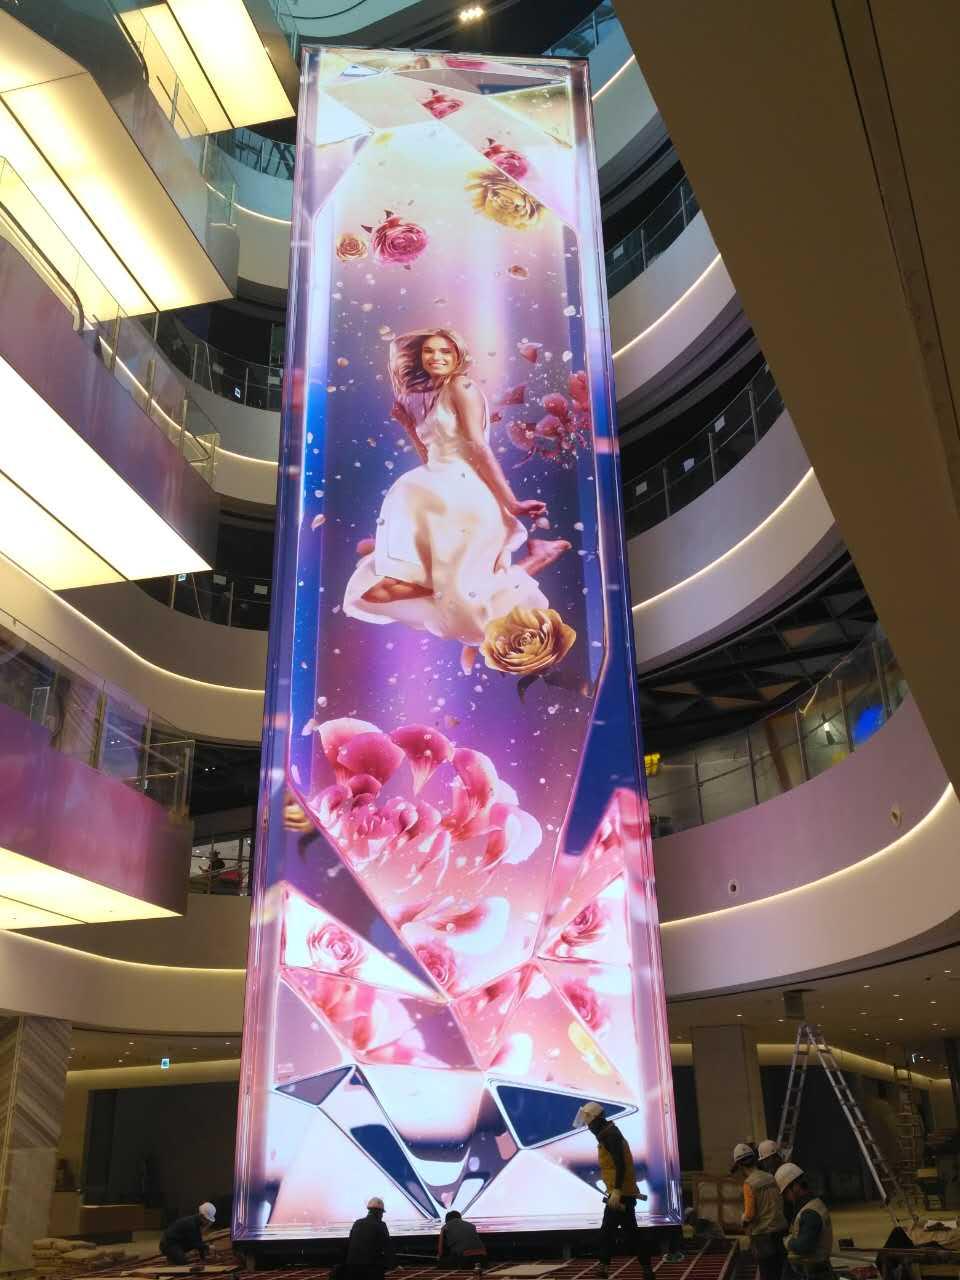 Uslim3.9 in Korea SHINSEGAE, New world department store, 3 sides, 22m high 2